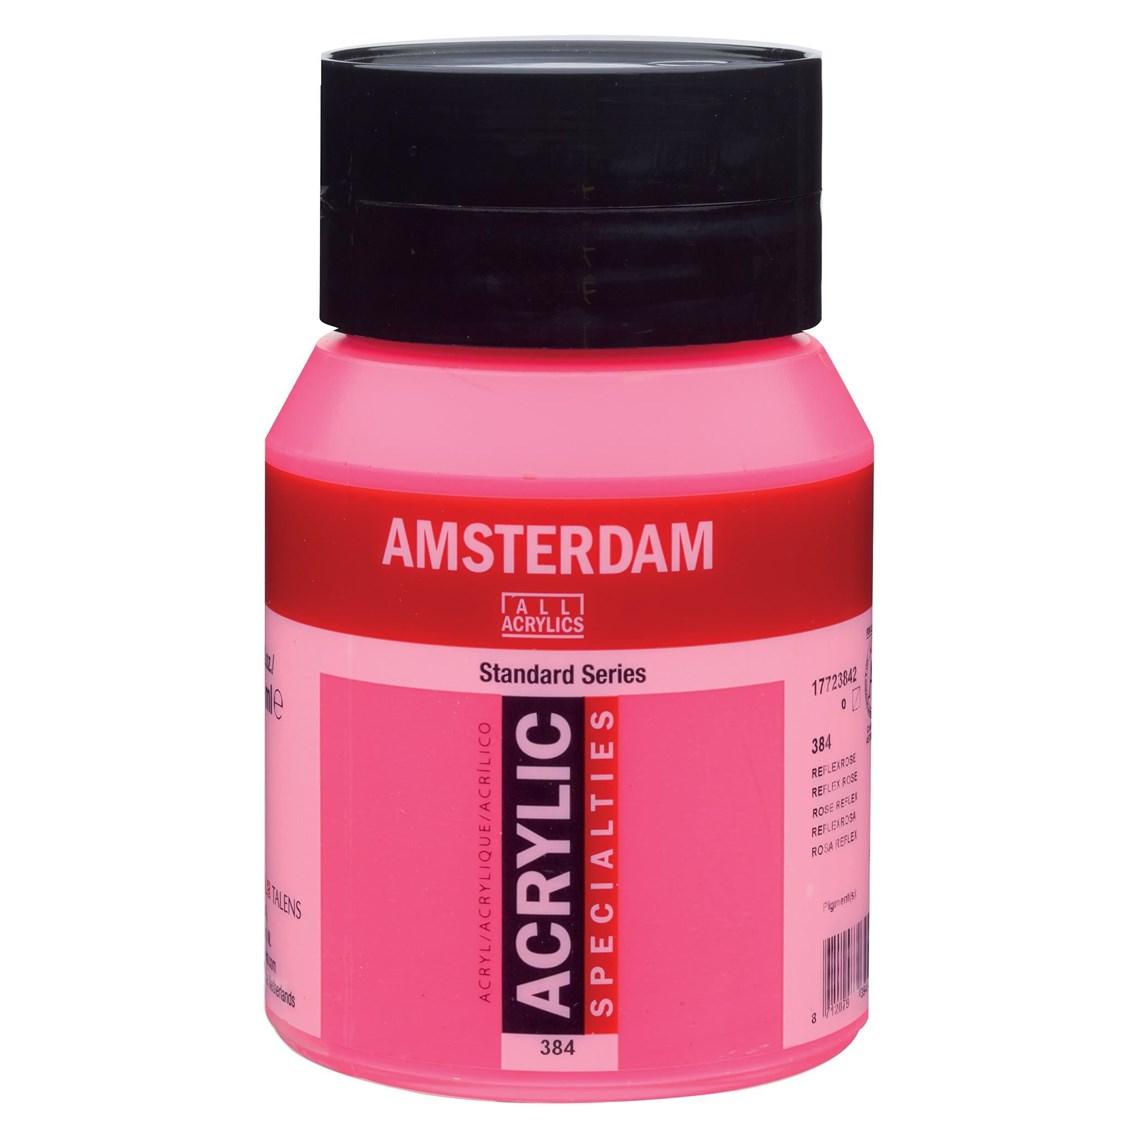 Amsterdam Acryl Reflexroze 384 specialties Angelart Kunst en zo